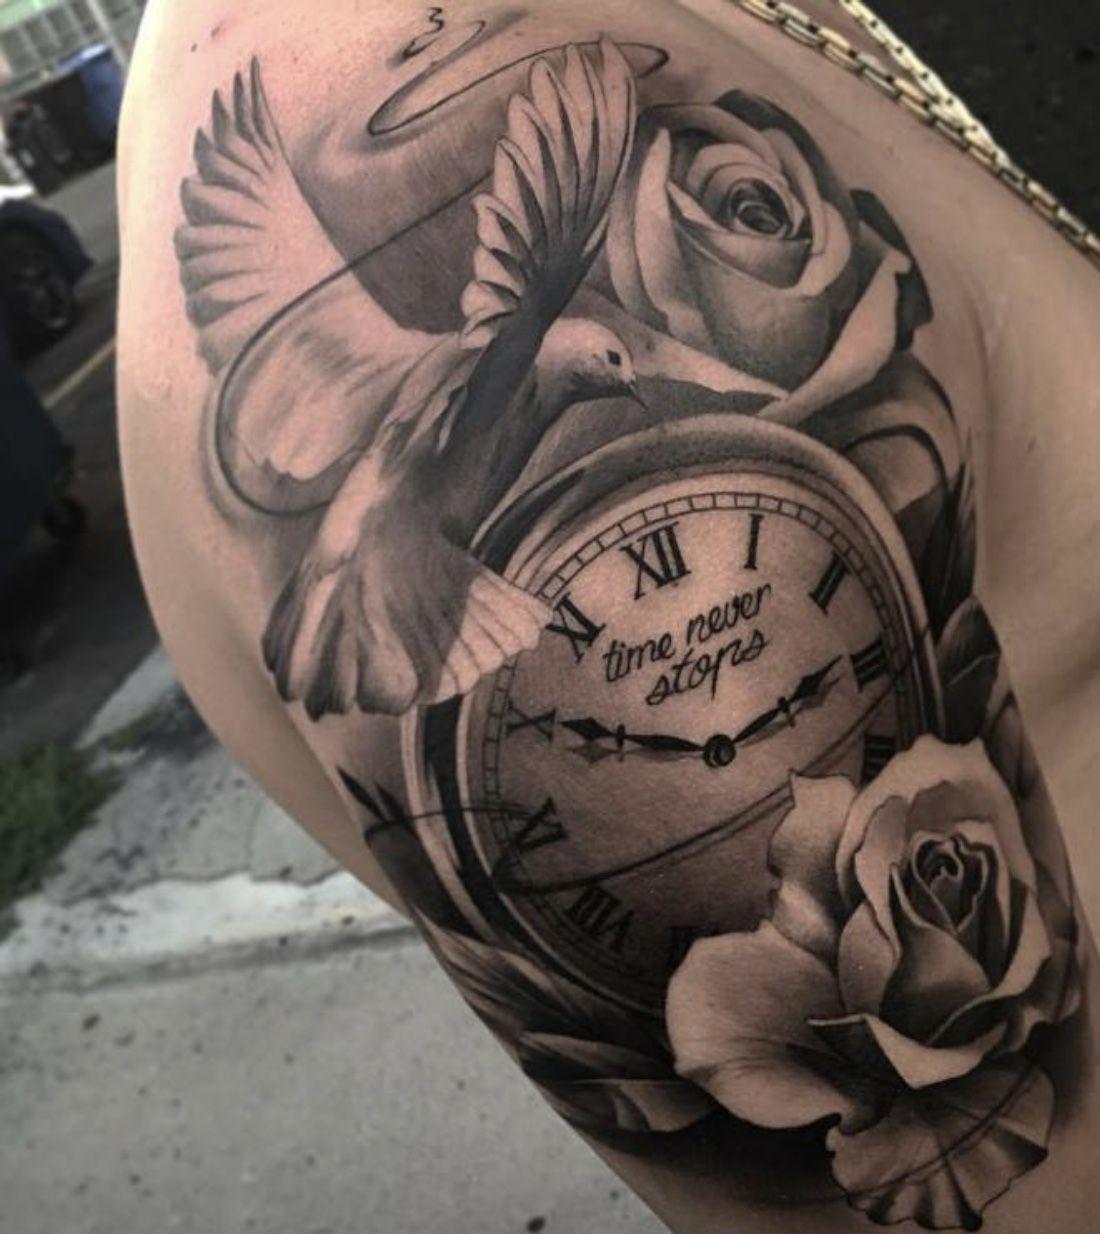 Tatouage Avant Bras Homme Rose Horloge Kolorisse Developpement